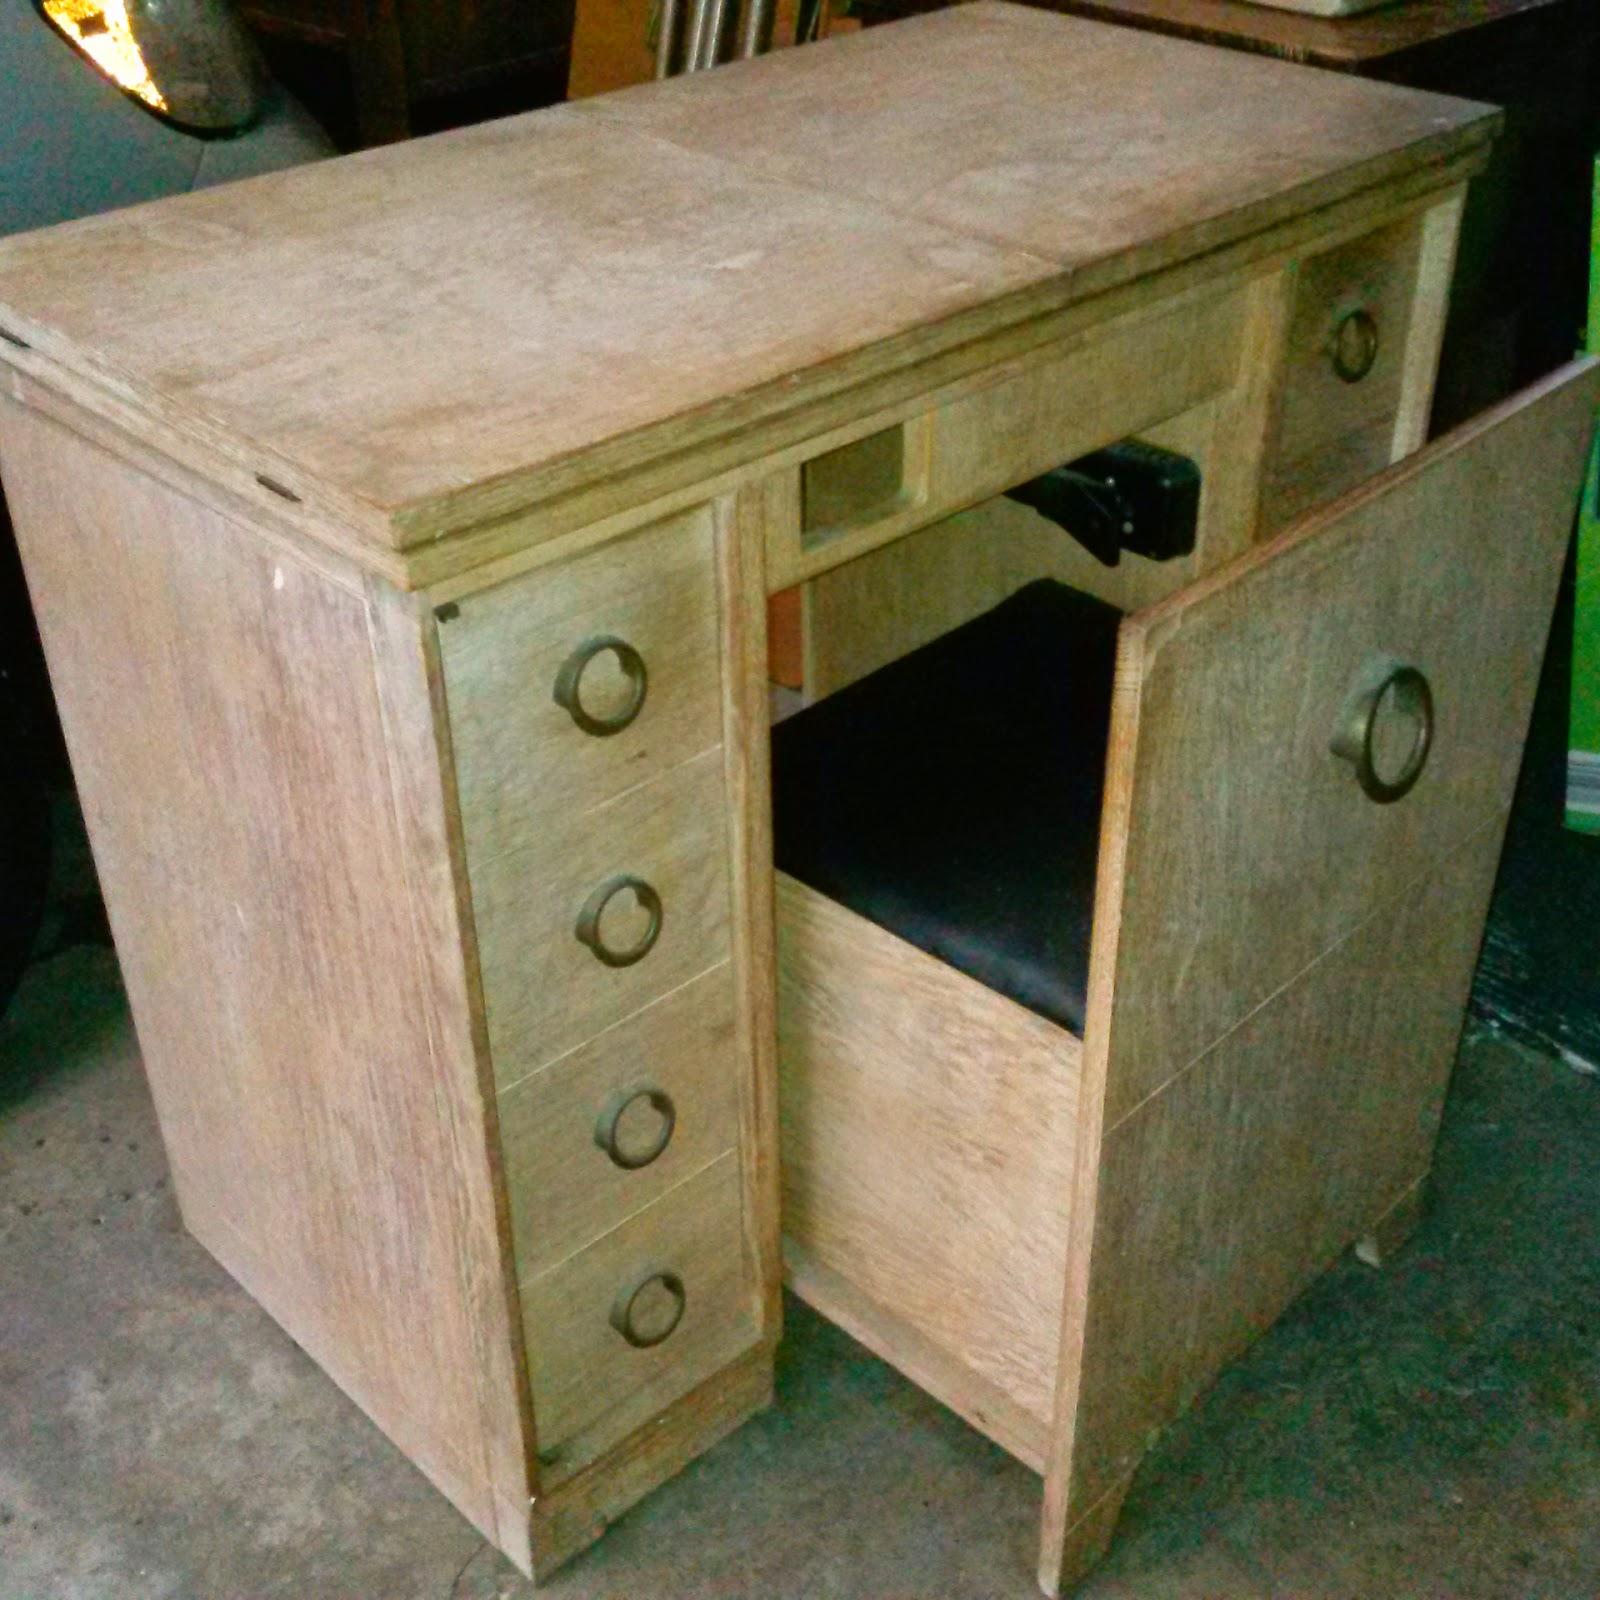 Sewing Machine Mavin The Cabinet Craze